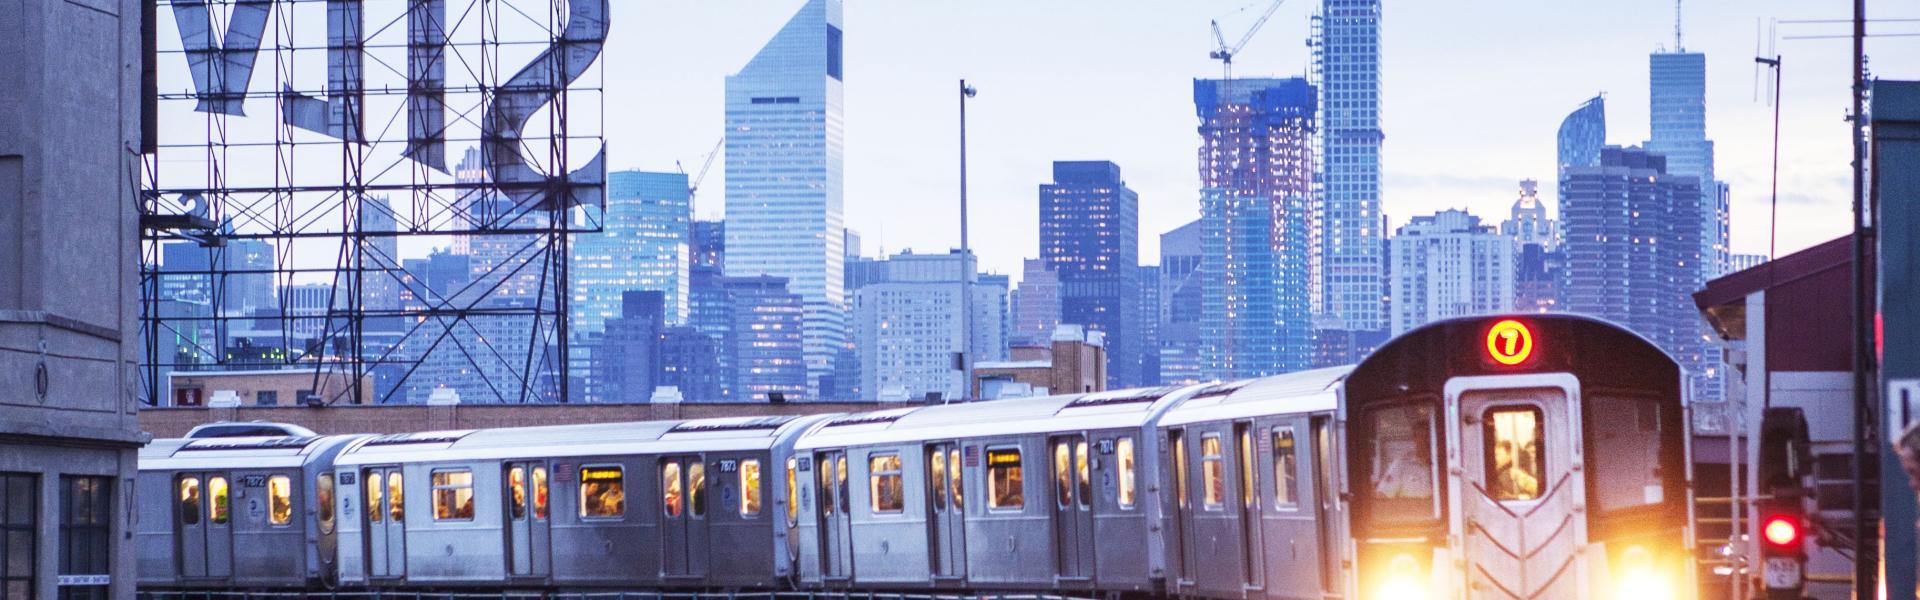 7 train, queens, subway,transportation, nyc